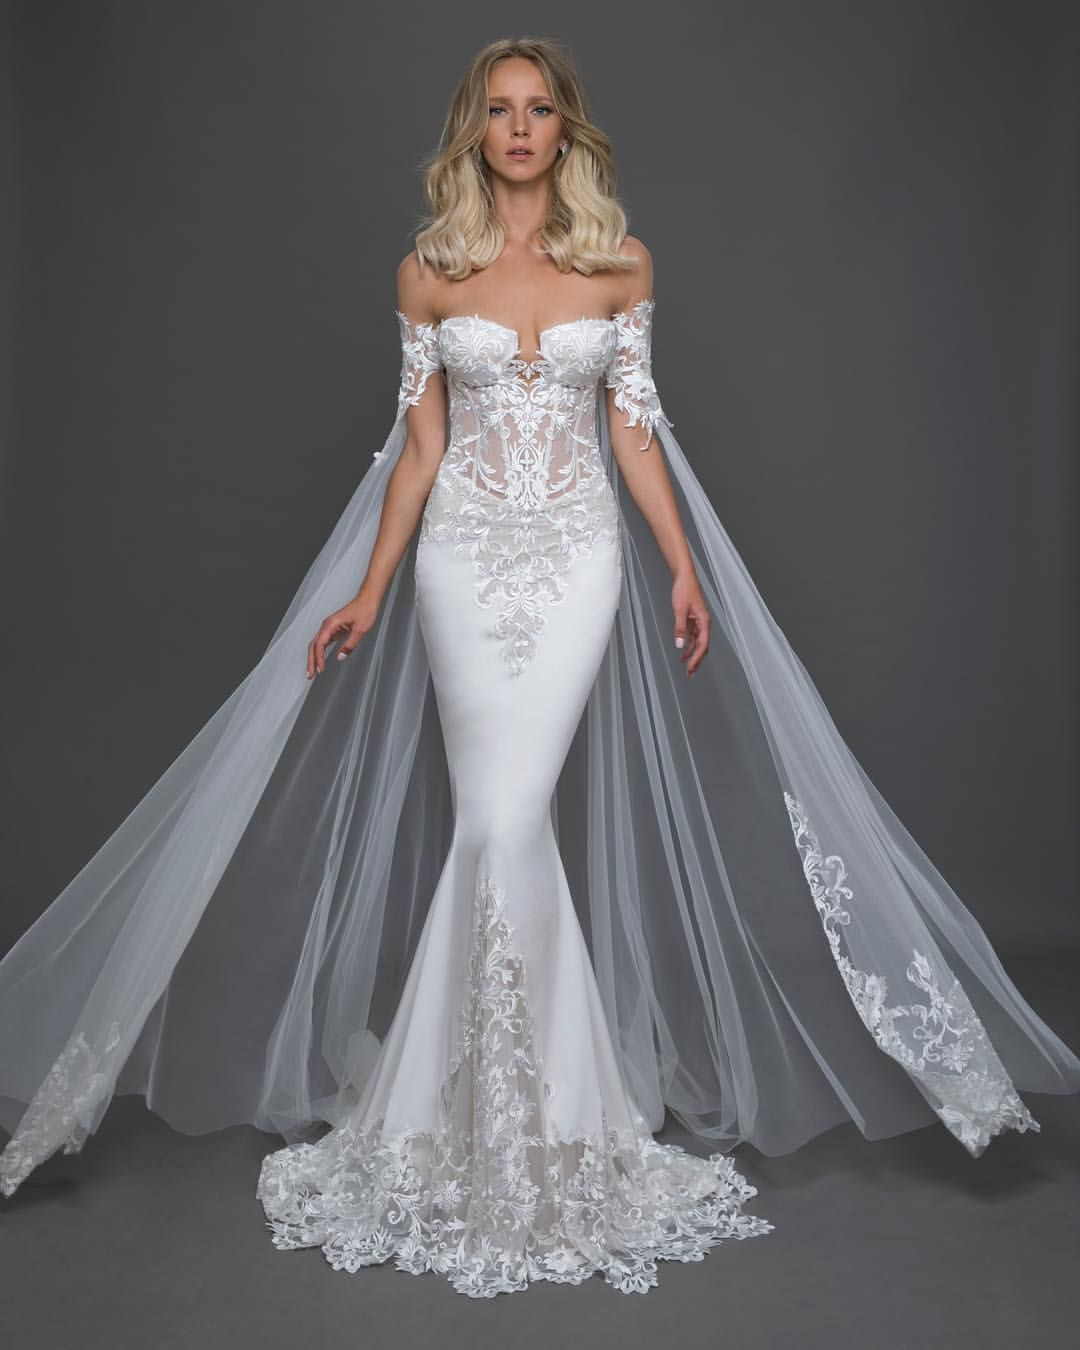 Mi Piace 4 397 Commenti 34 Pnina Tornai Pninatornai Su Instagram This Cape Adds A Regal T Pnina Tornai Wedding Dress Wedding Dresses Bridal Dresses